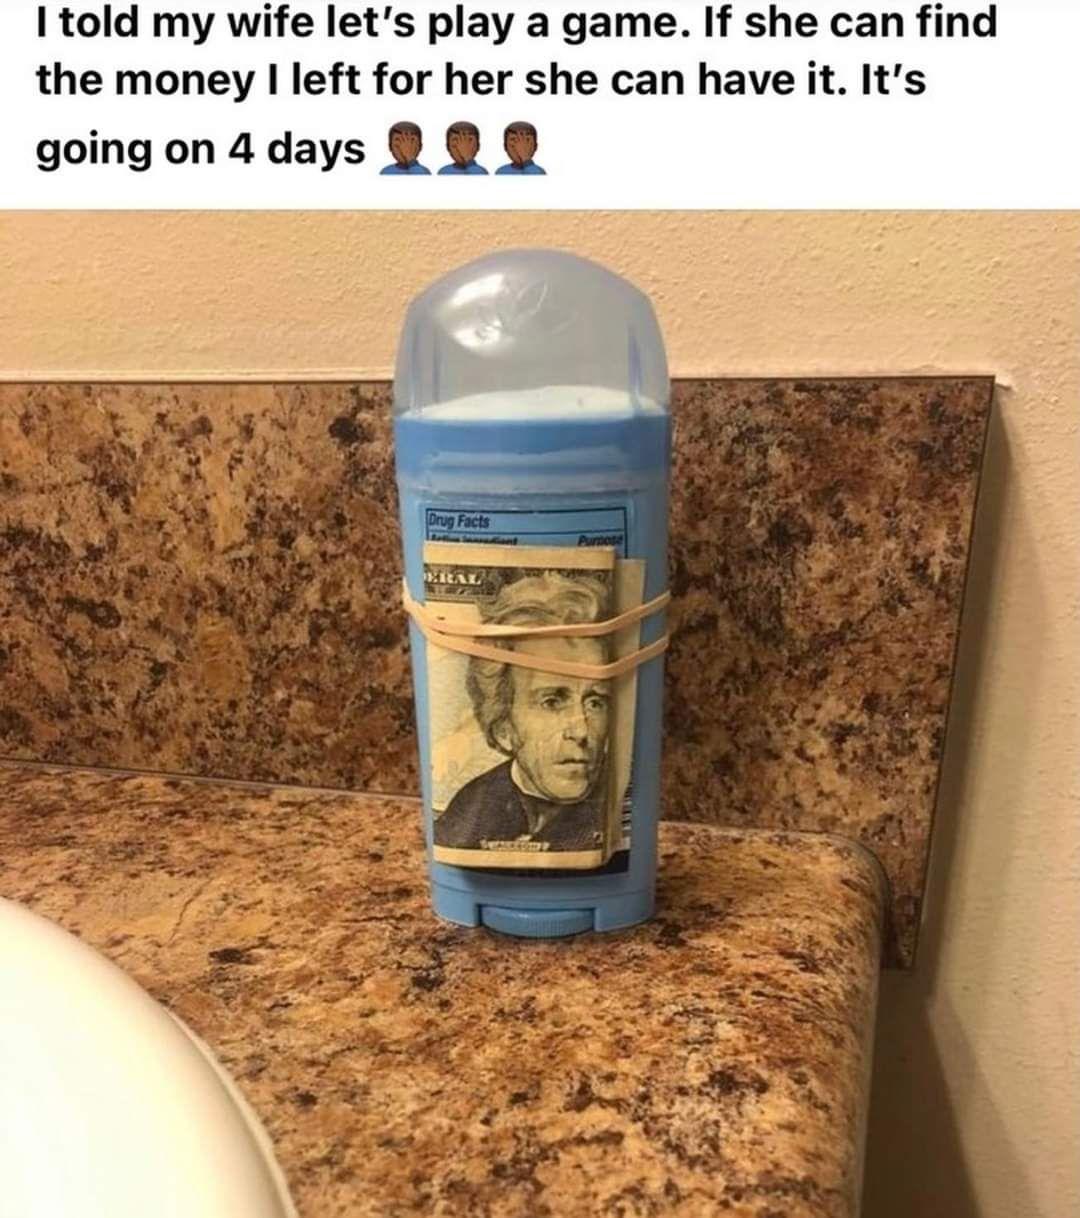 The deodorant hides the money scent hehe